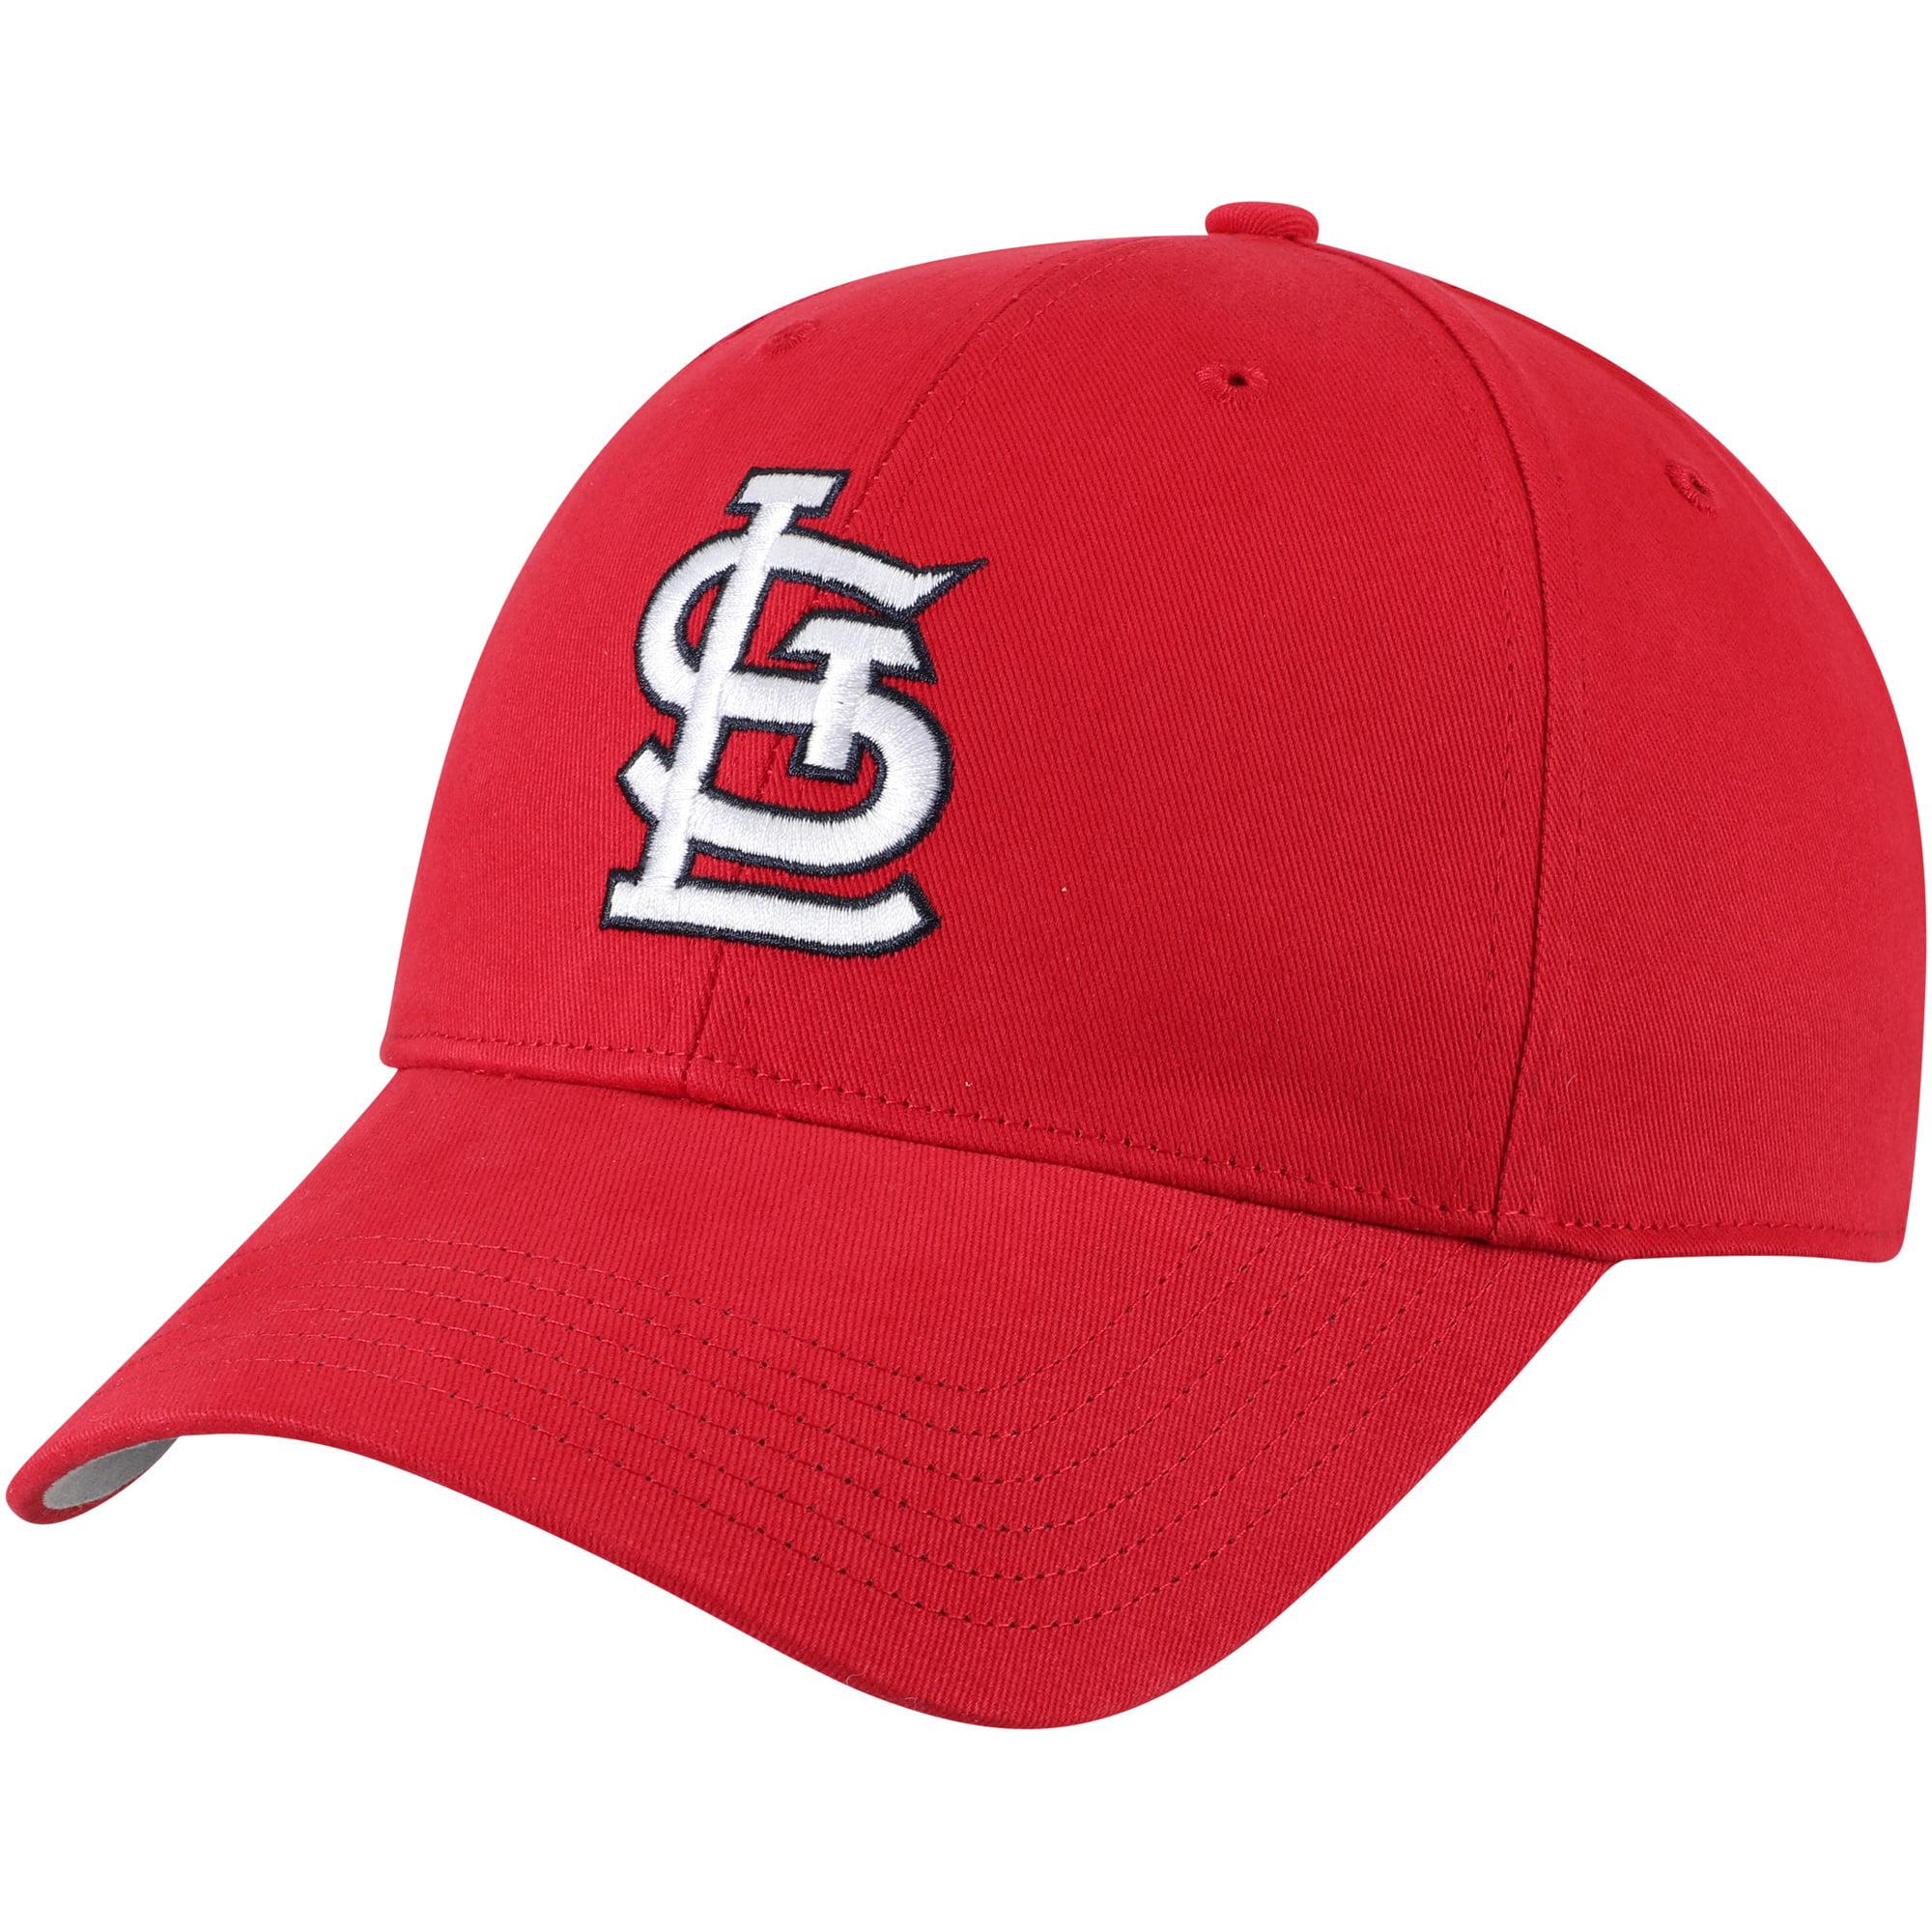 c4e202520eb26 St. Louis Cardinals Team Shop - Walmart.com